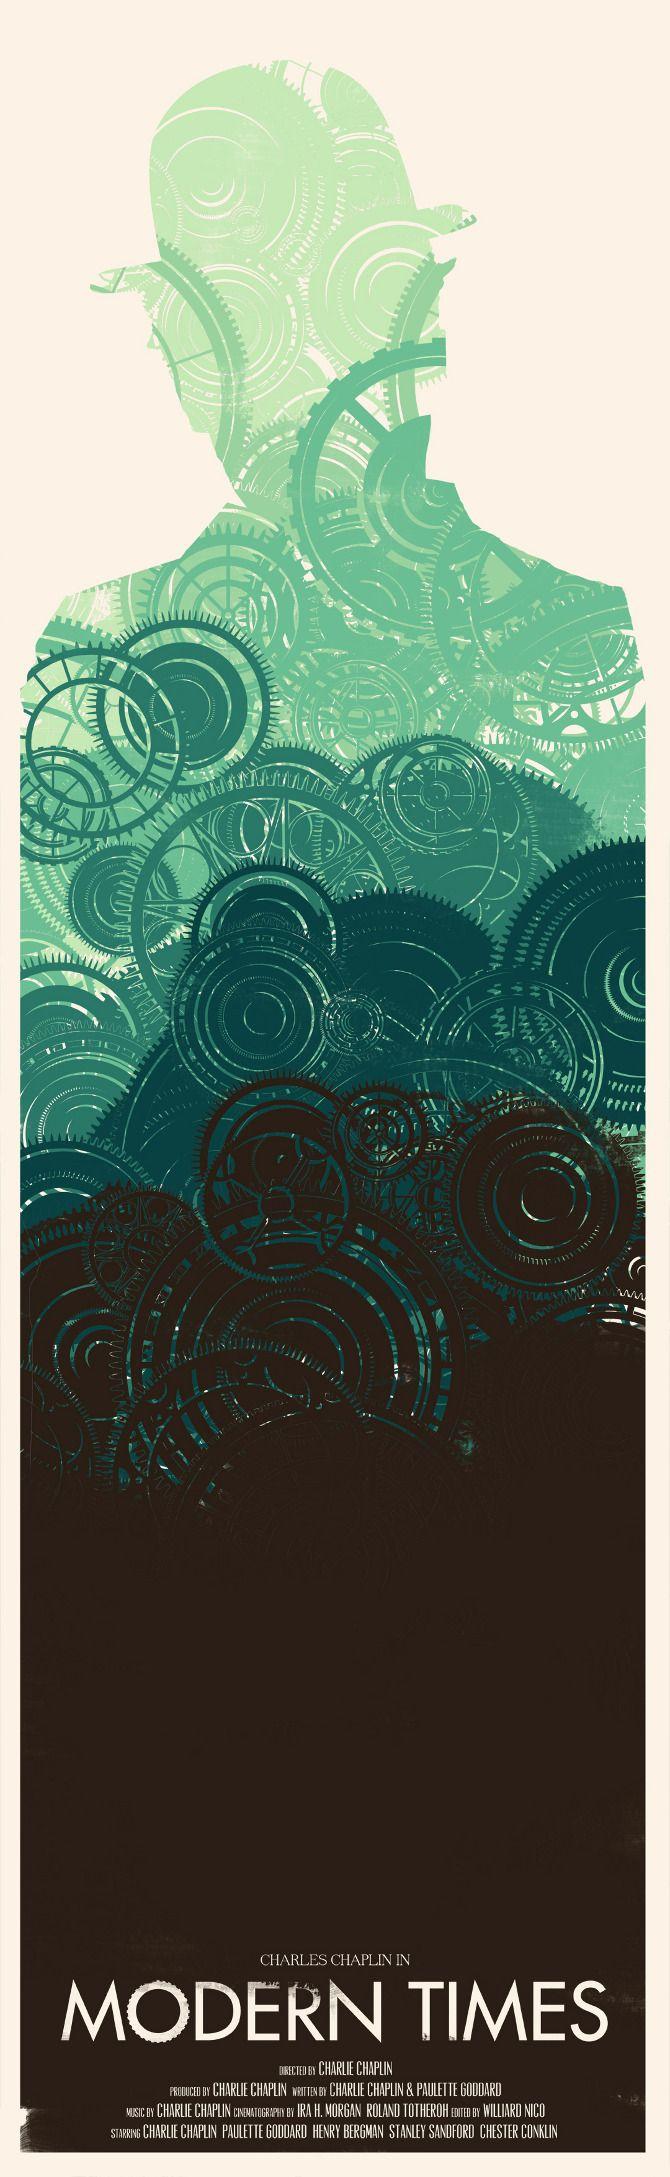 Films - Marinko Milosevski Illustration and Design